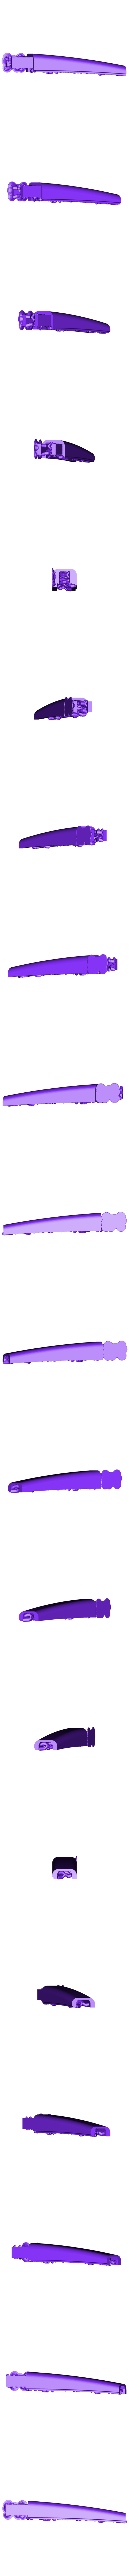 Pylon-Frt-Fair01ws.stl Download STL file Thrust Reverser with Turbofan Engine Nacelle • 3D printable model, konchan77